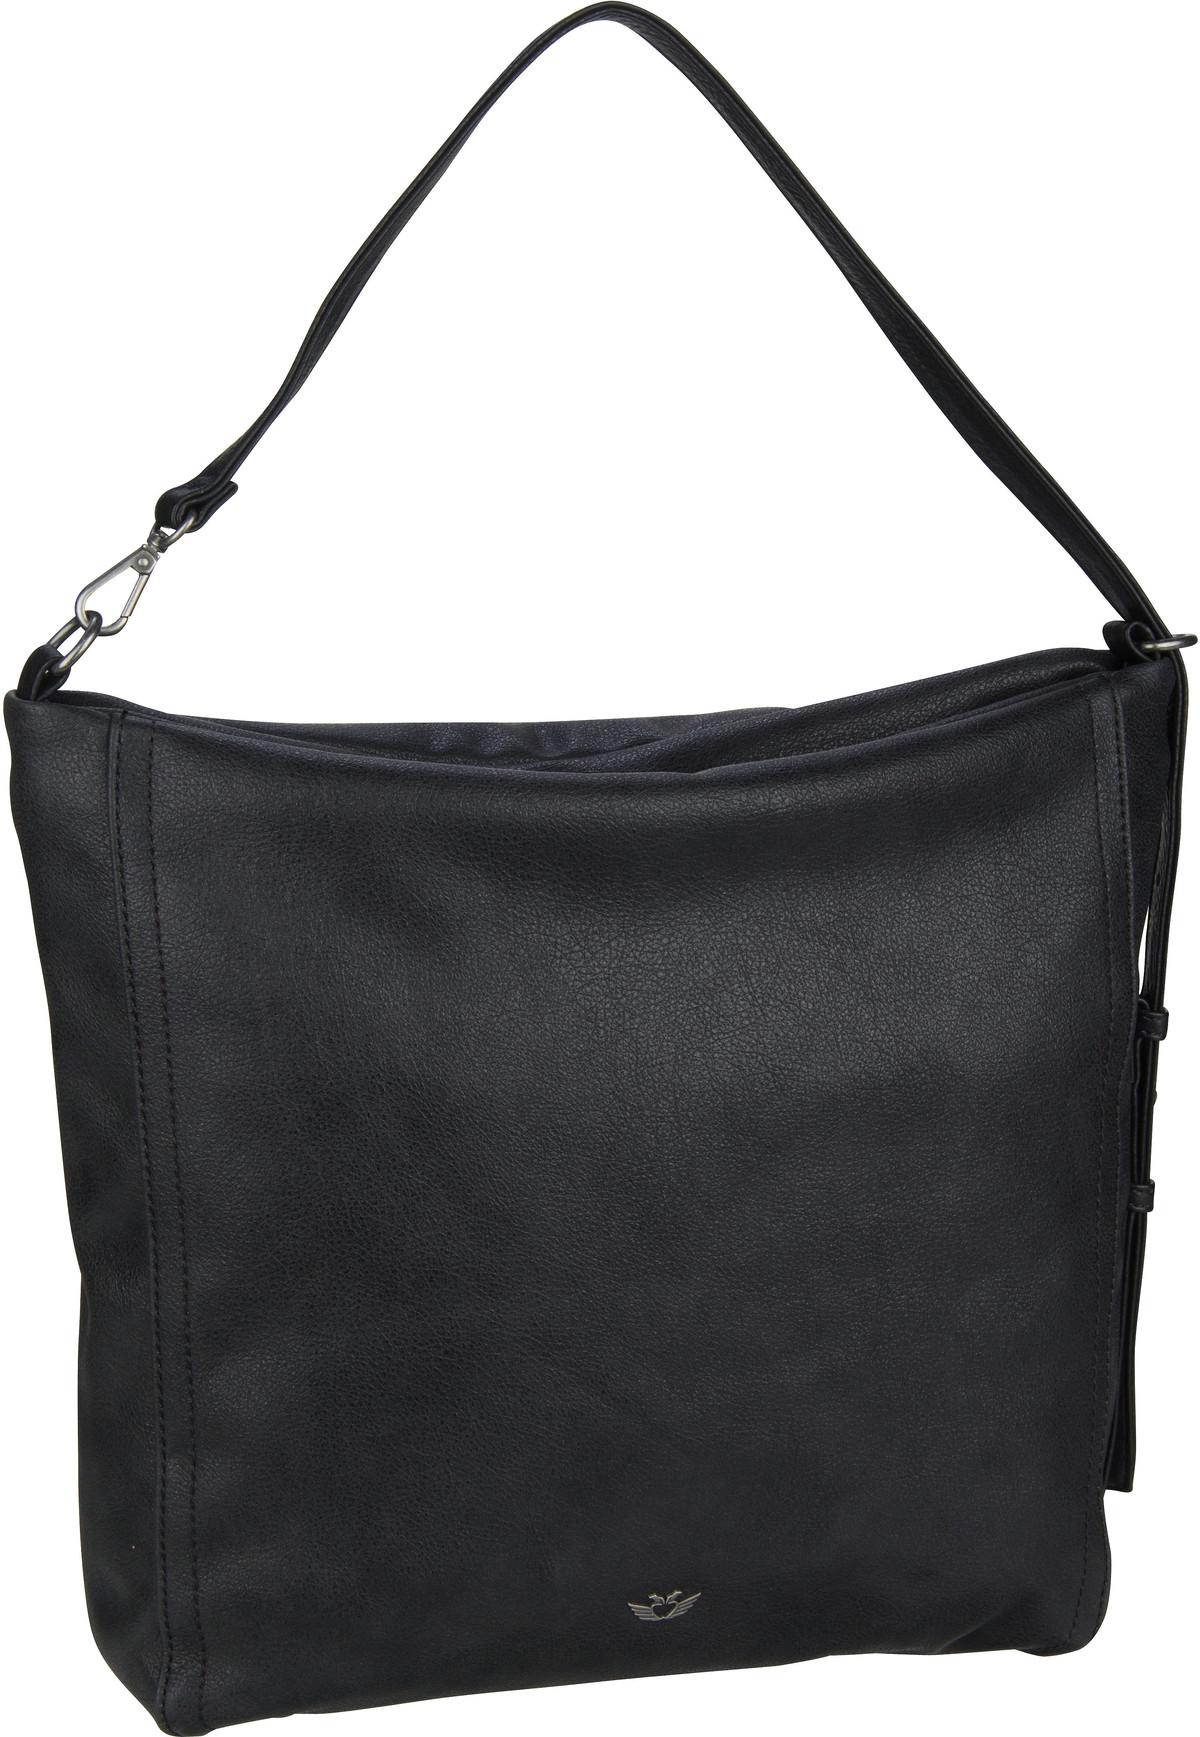 Handtasche Irka Orion Black